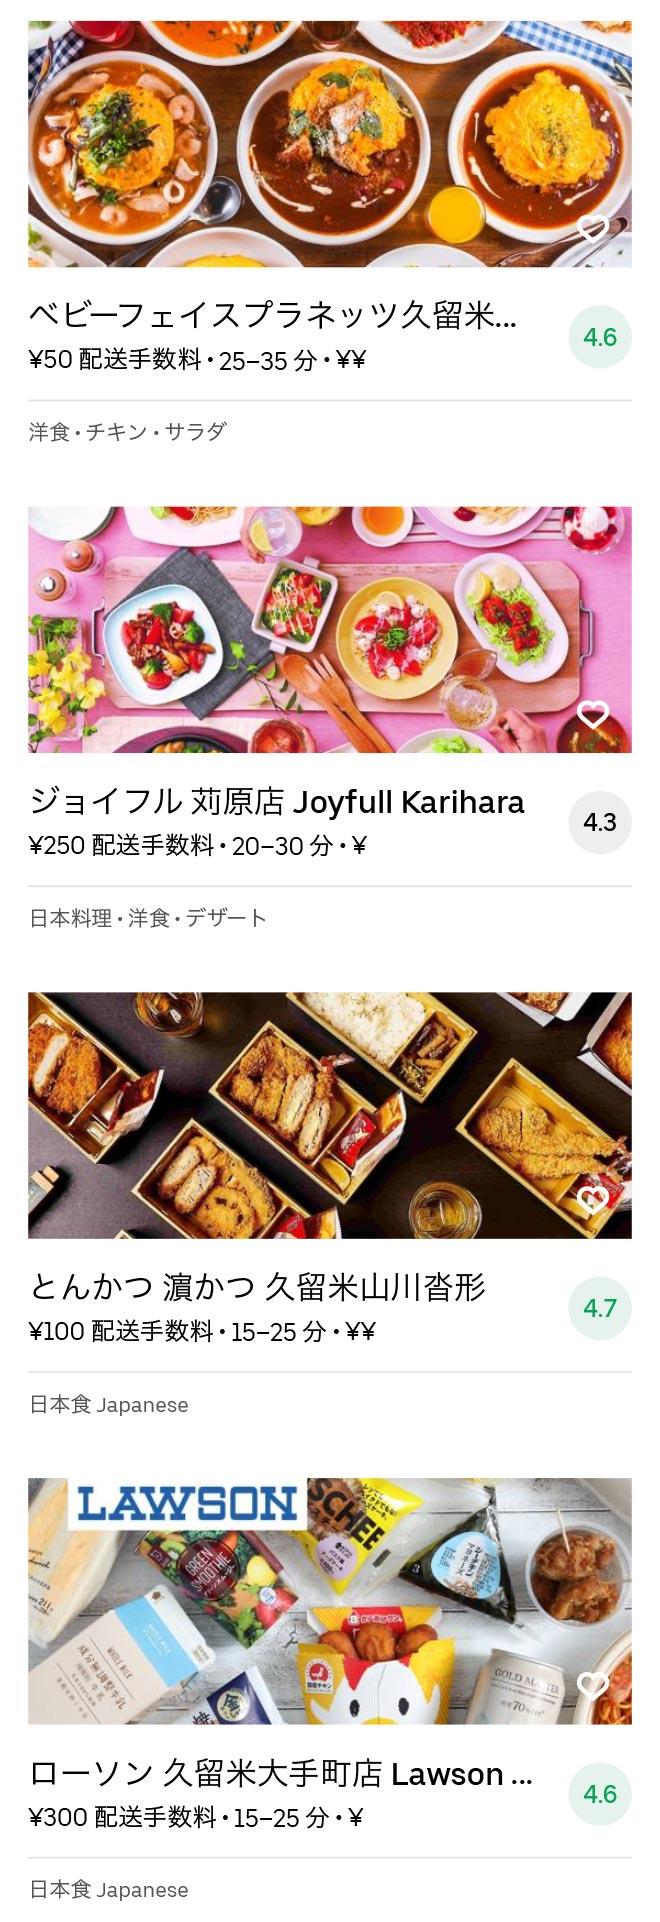 Kurume daigakumae menu 2008 05